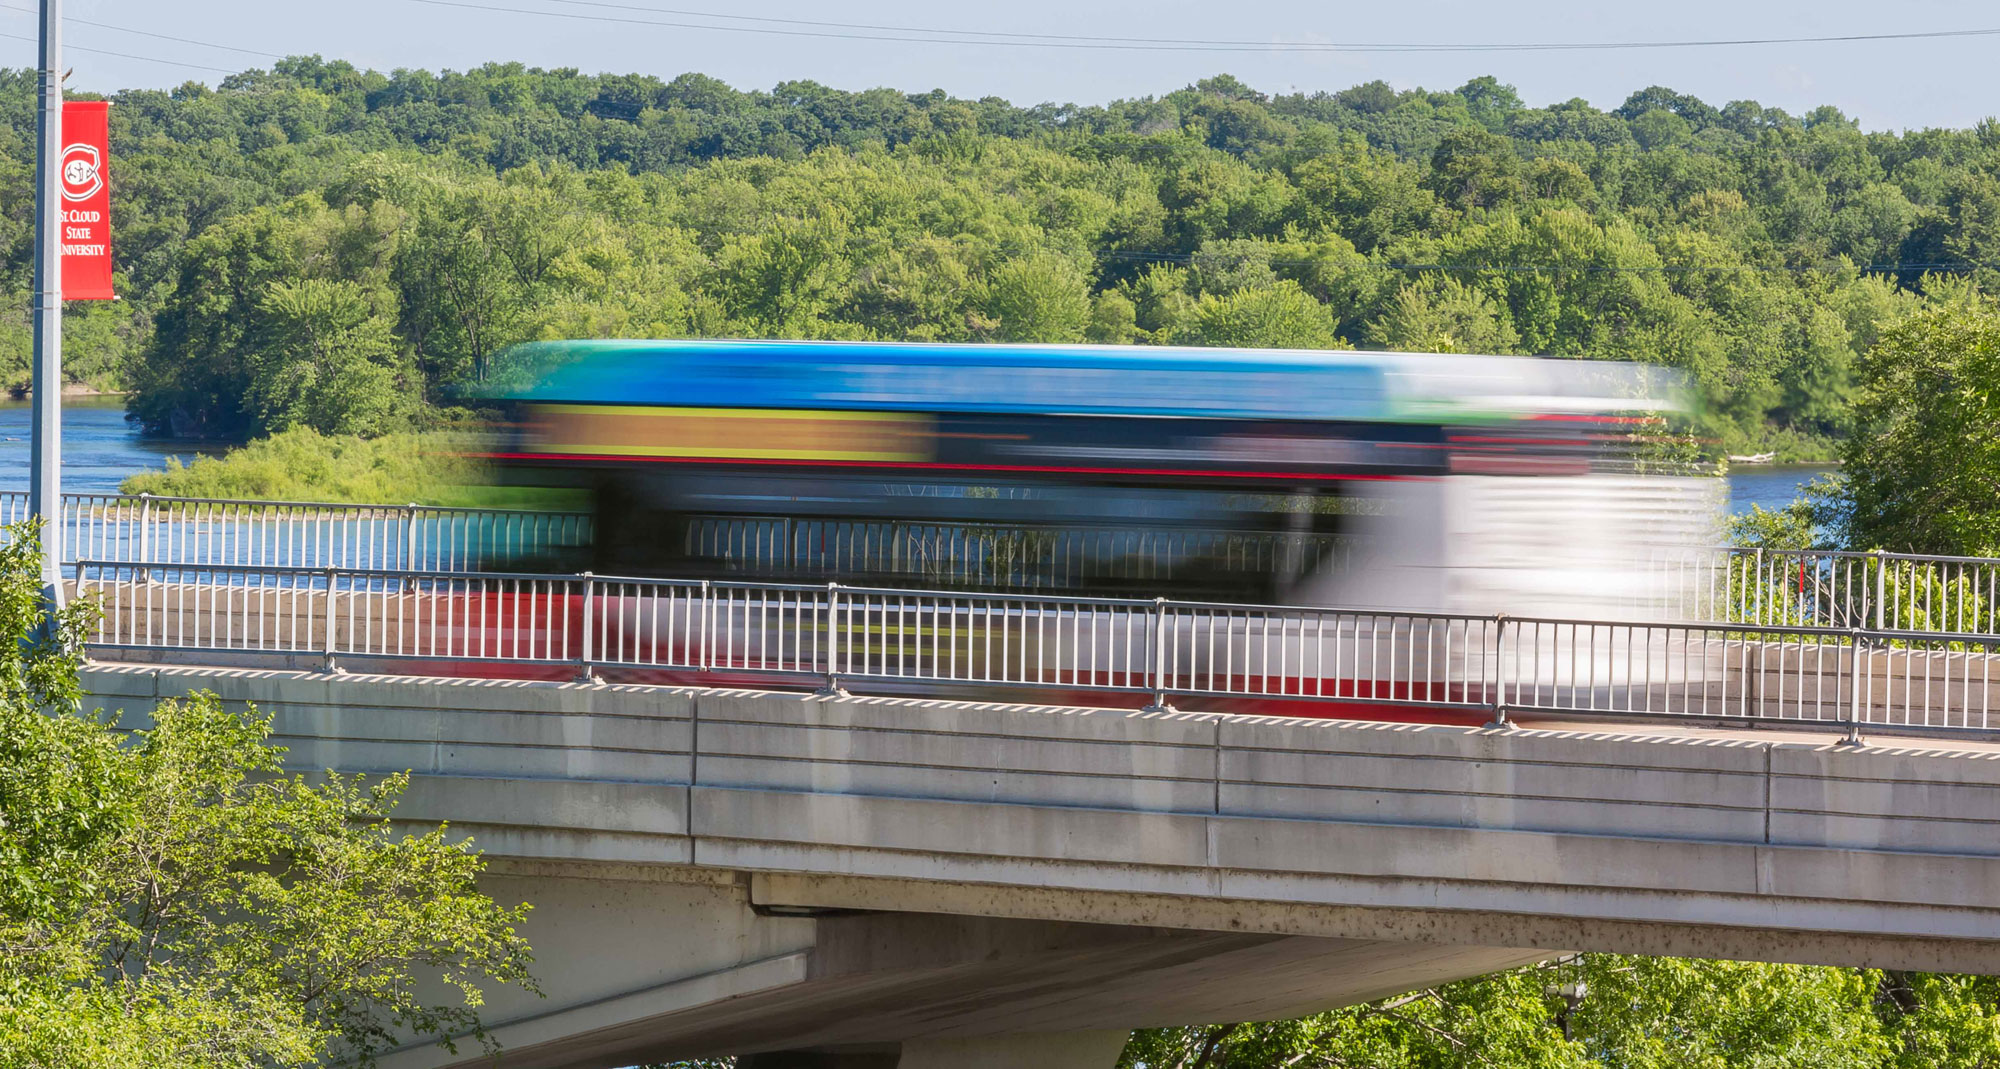 IMAGE: Metro Bus on Bridge